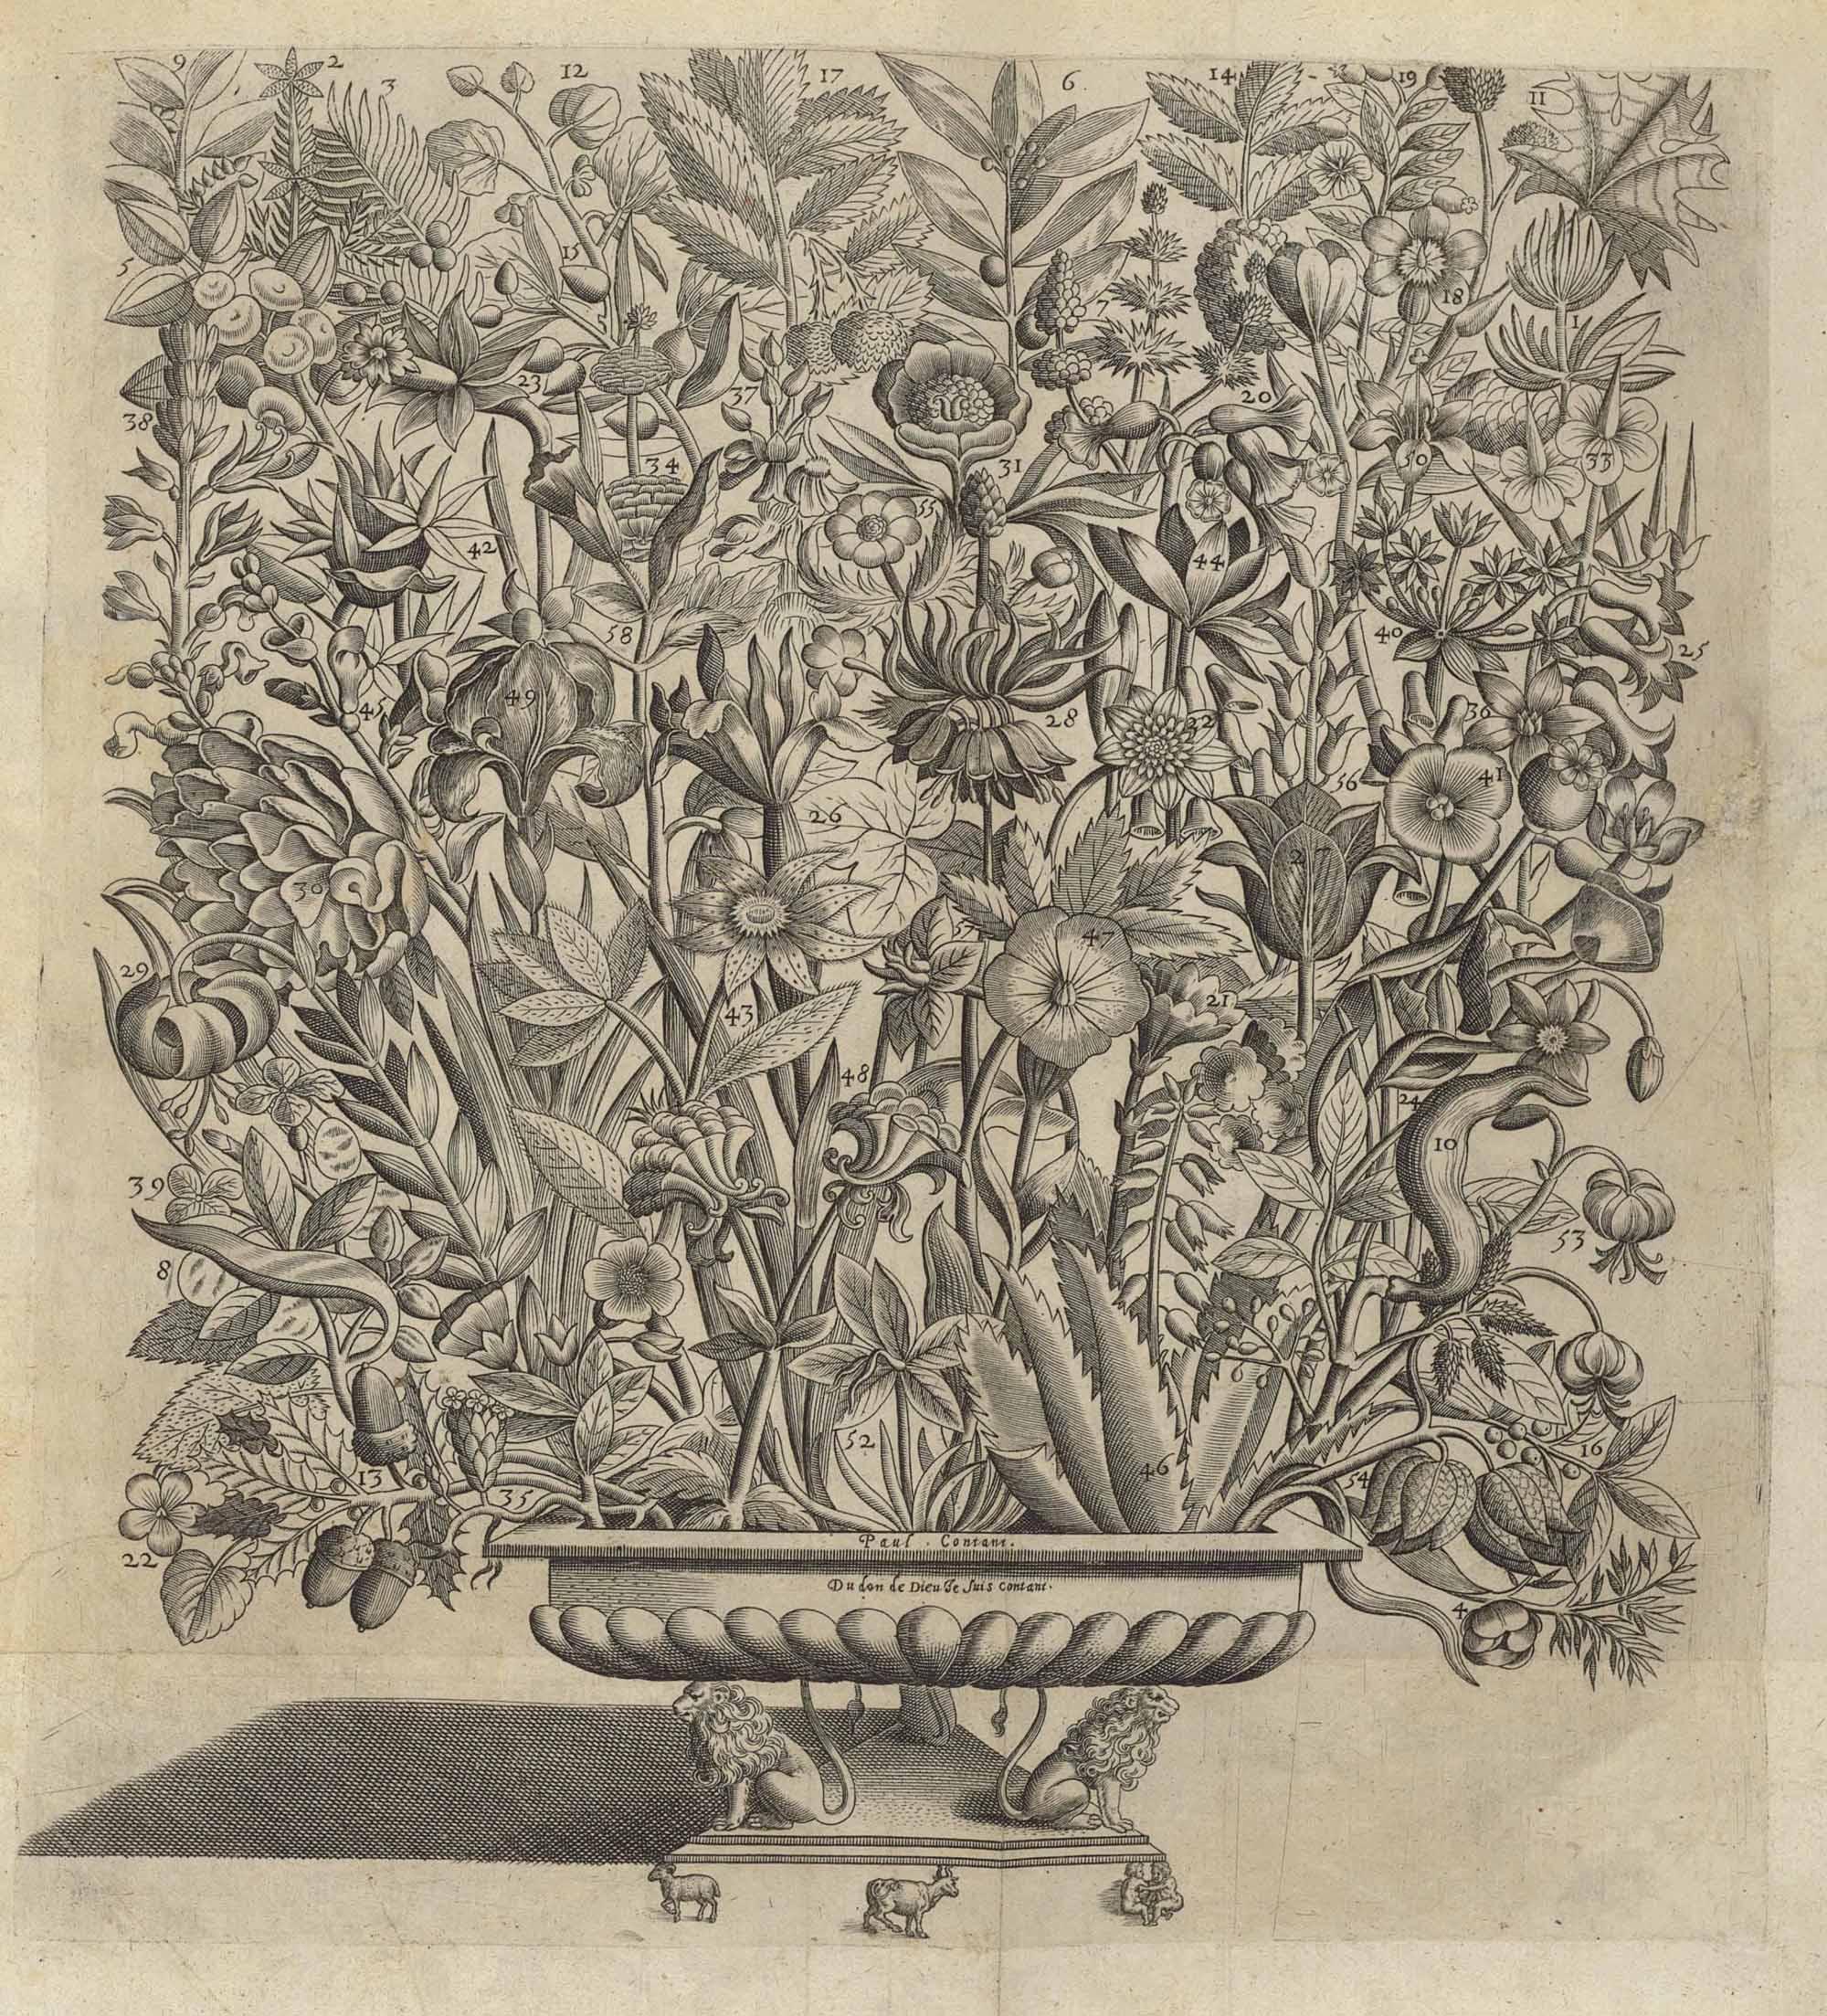 CONTANT, Paul (c.1570-1632). L